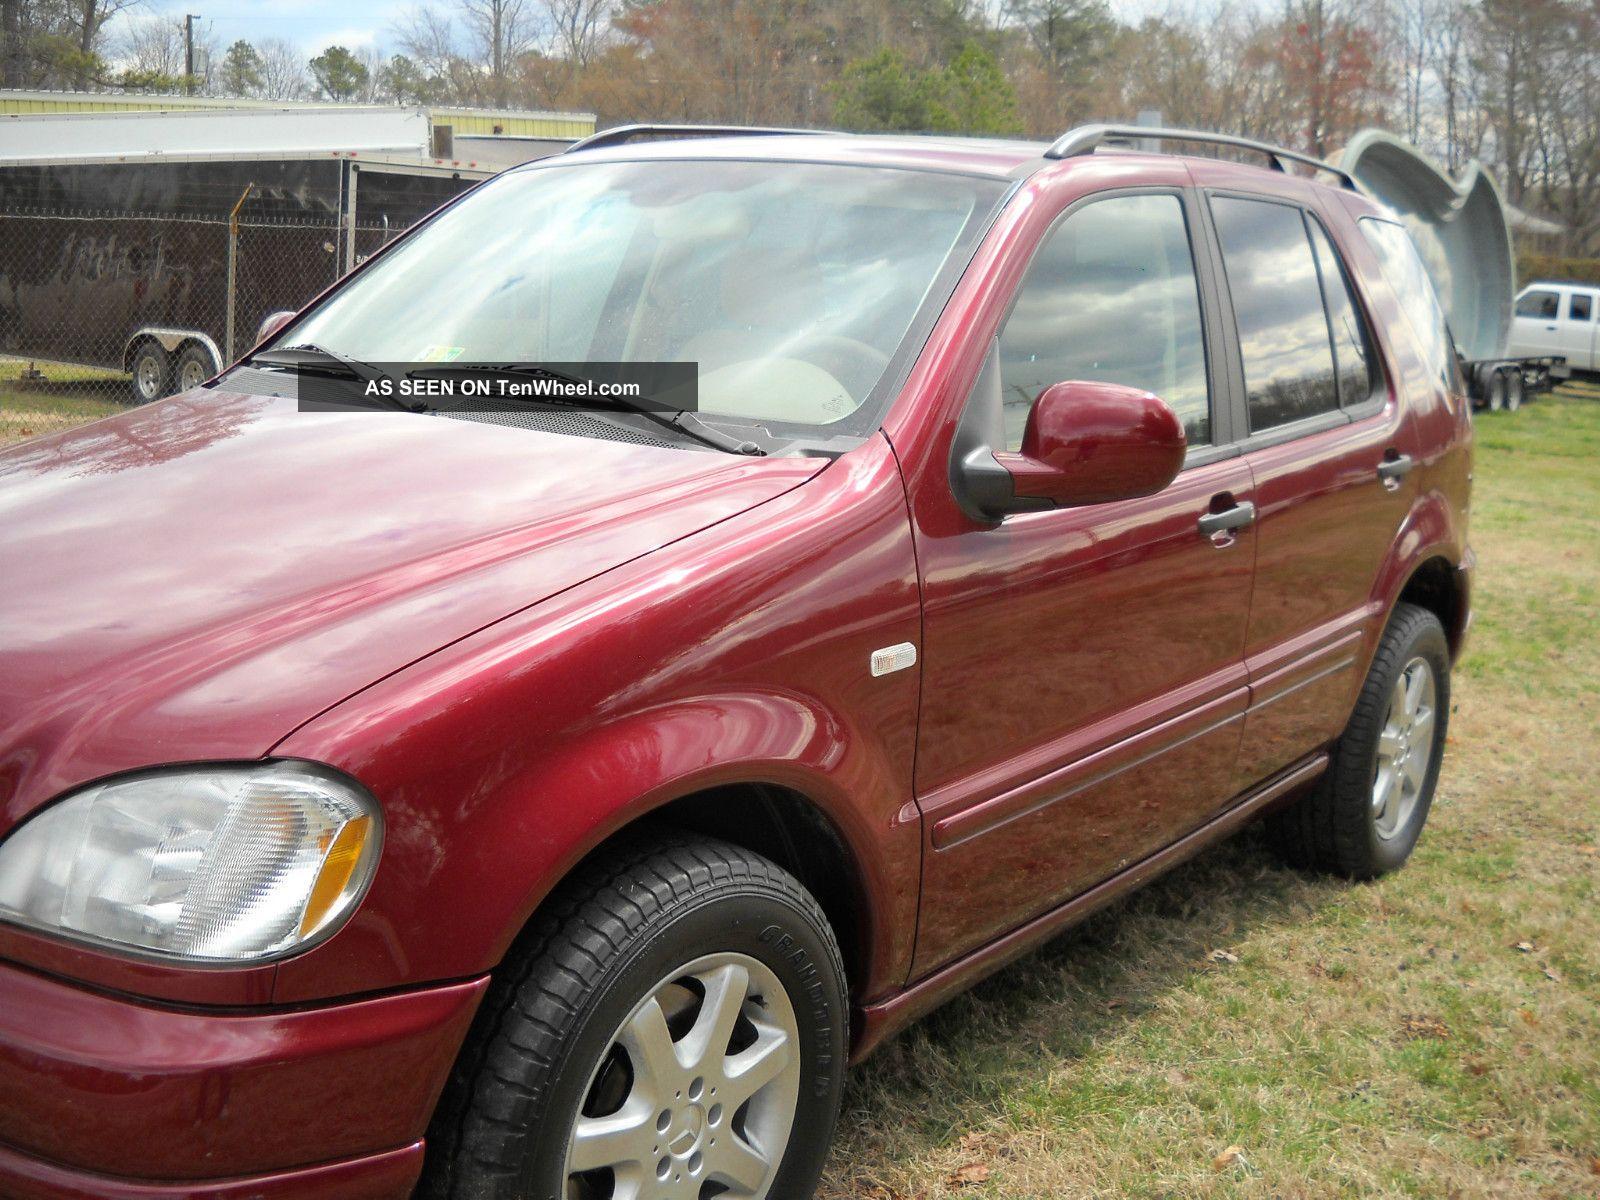 2001 mercedes benz ml430 base sport utility 4 door 4 3l for Mercedes benz ml430